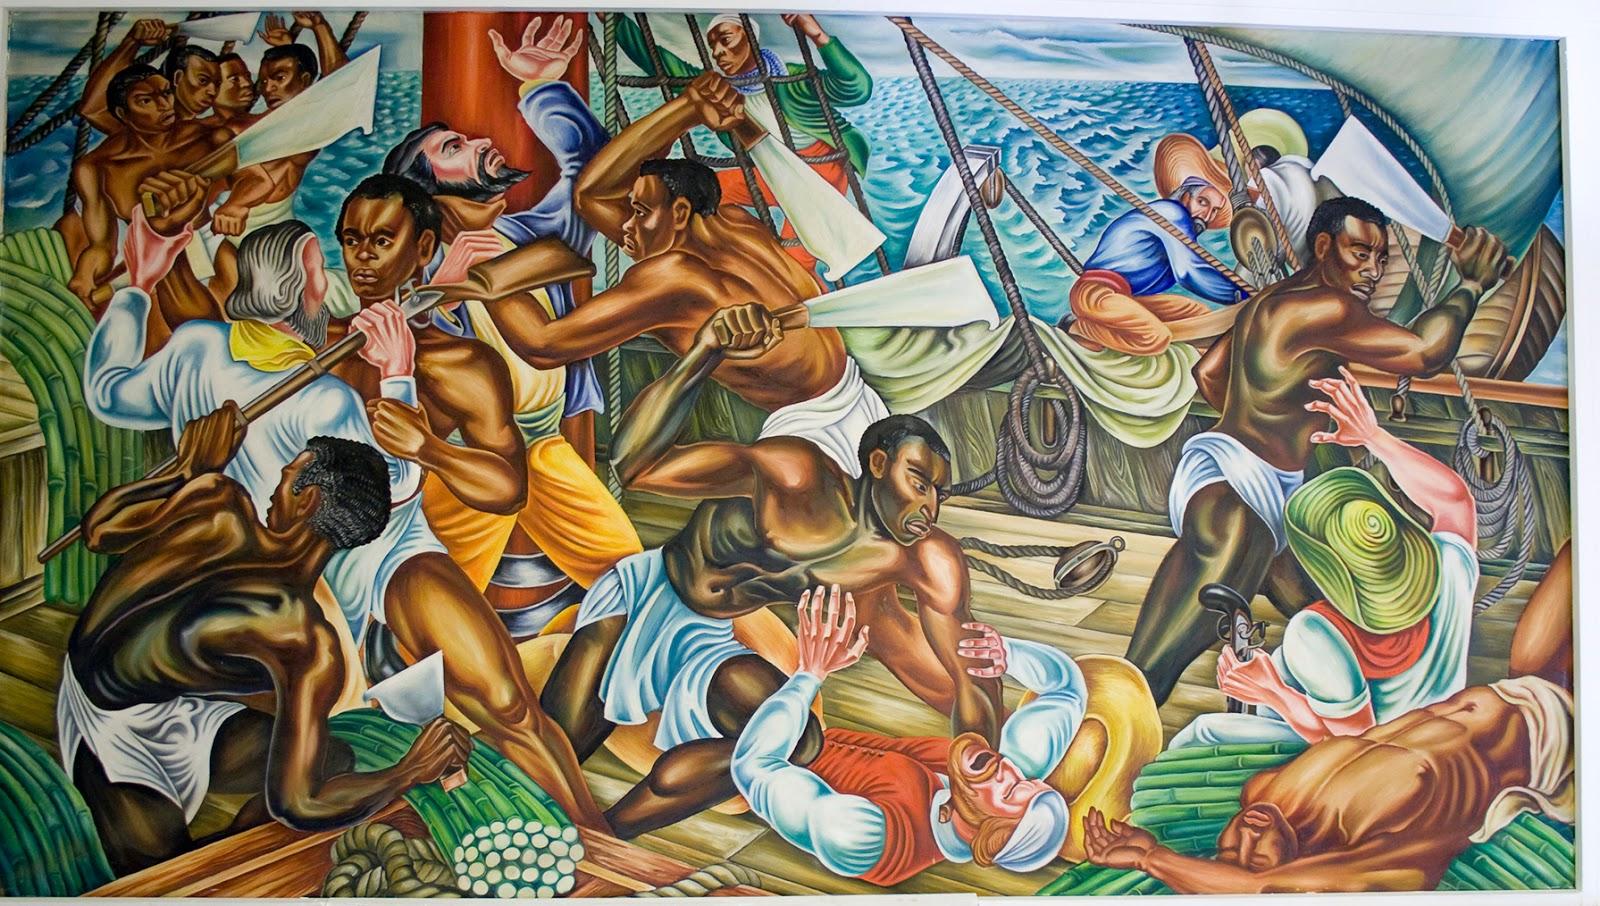 bethel university nonwestern art history images for